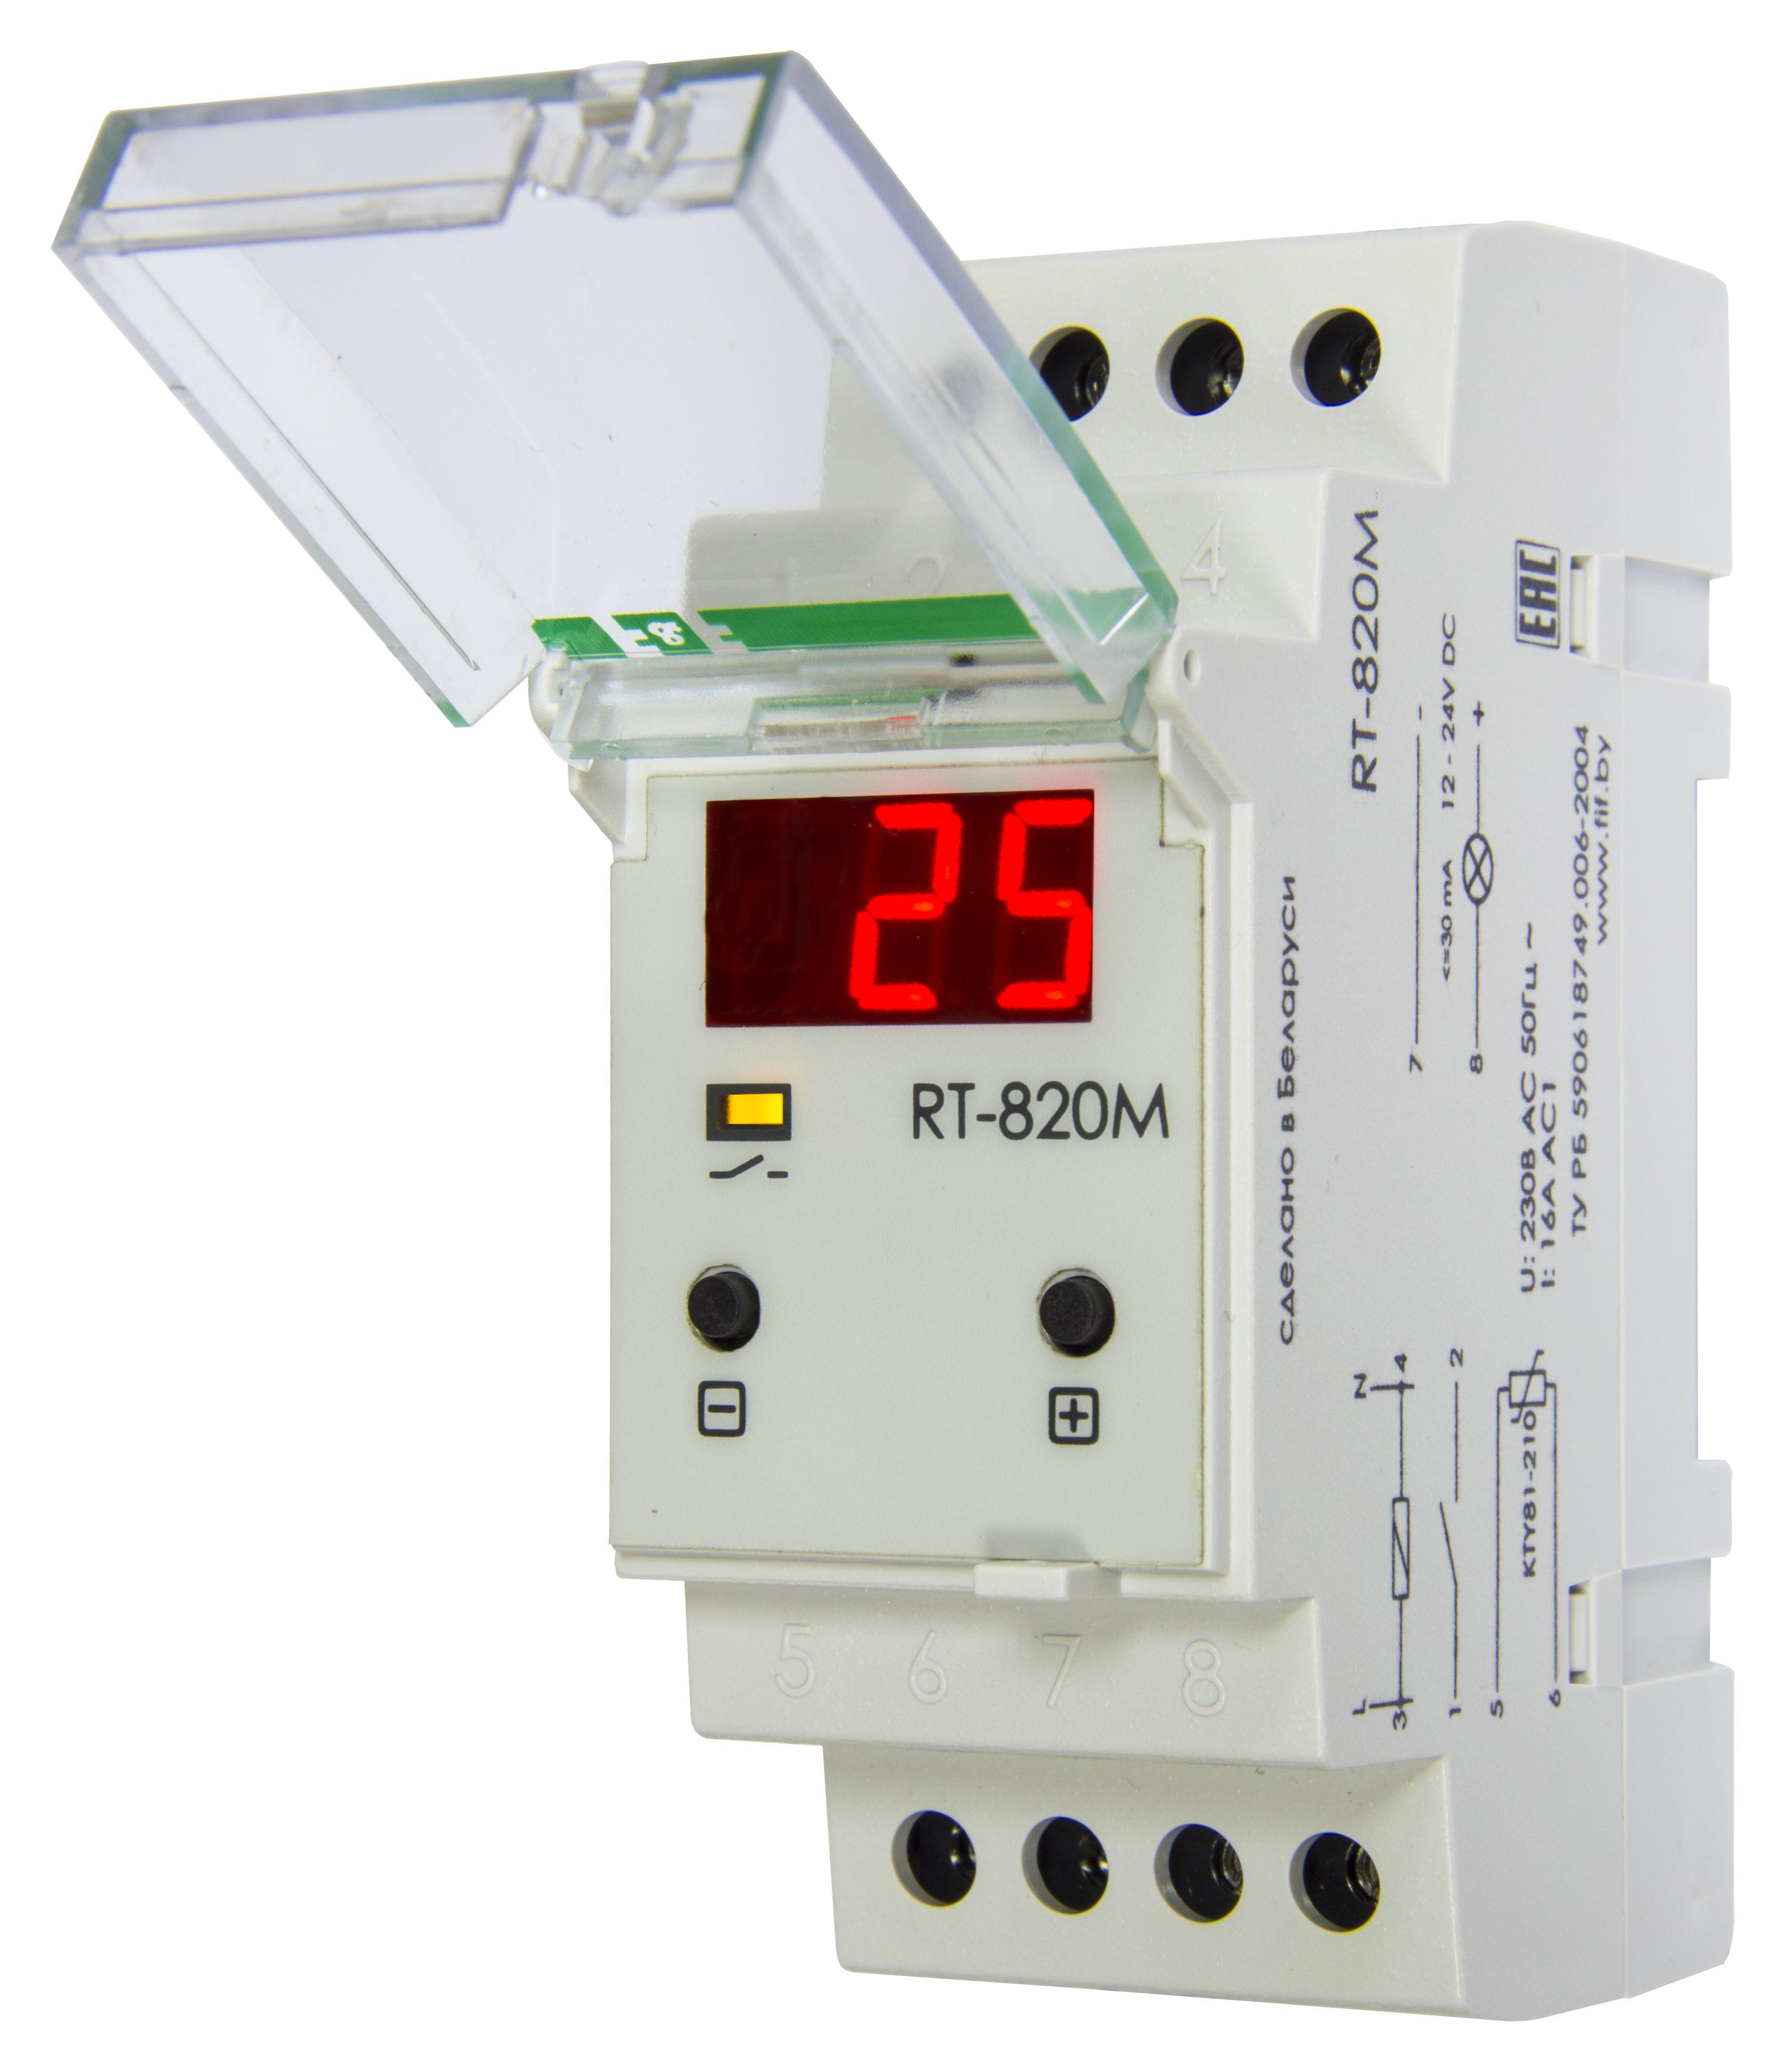 Купить Регулятор температуры RT-820 М (t от -20 до +130С), 230 В 50 Гц, Евроавтоматика ФиФ